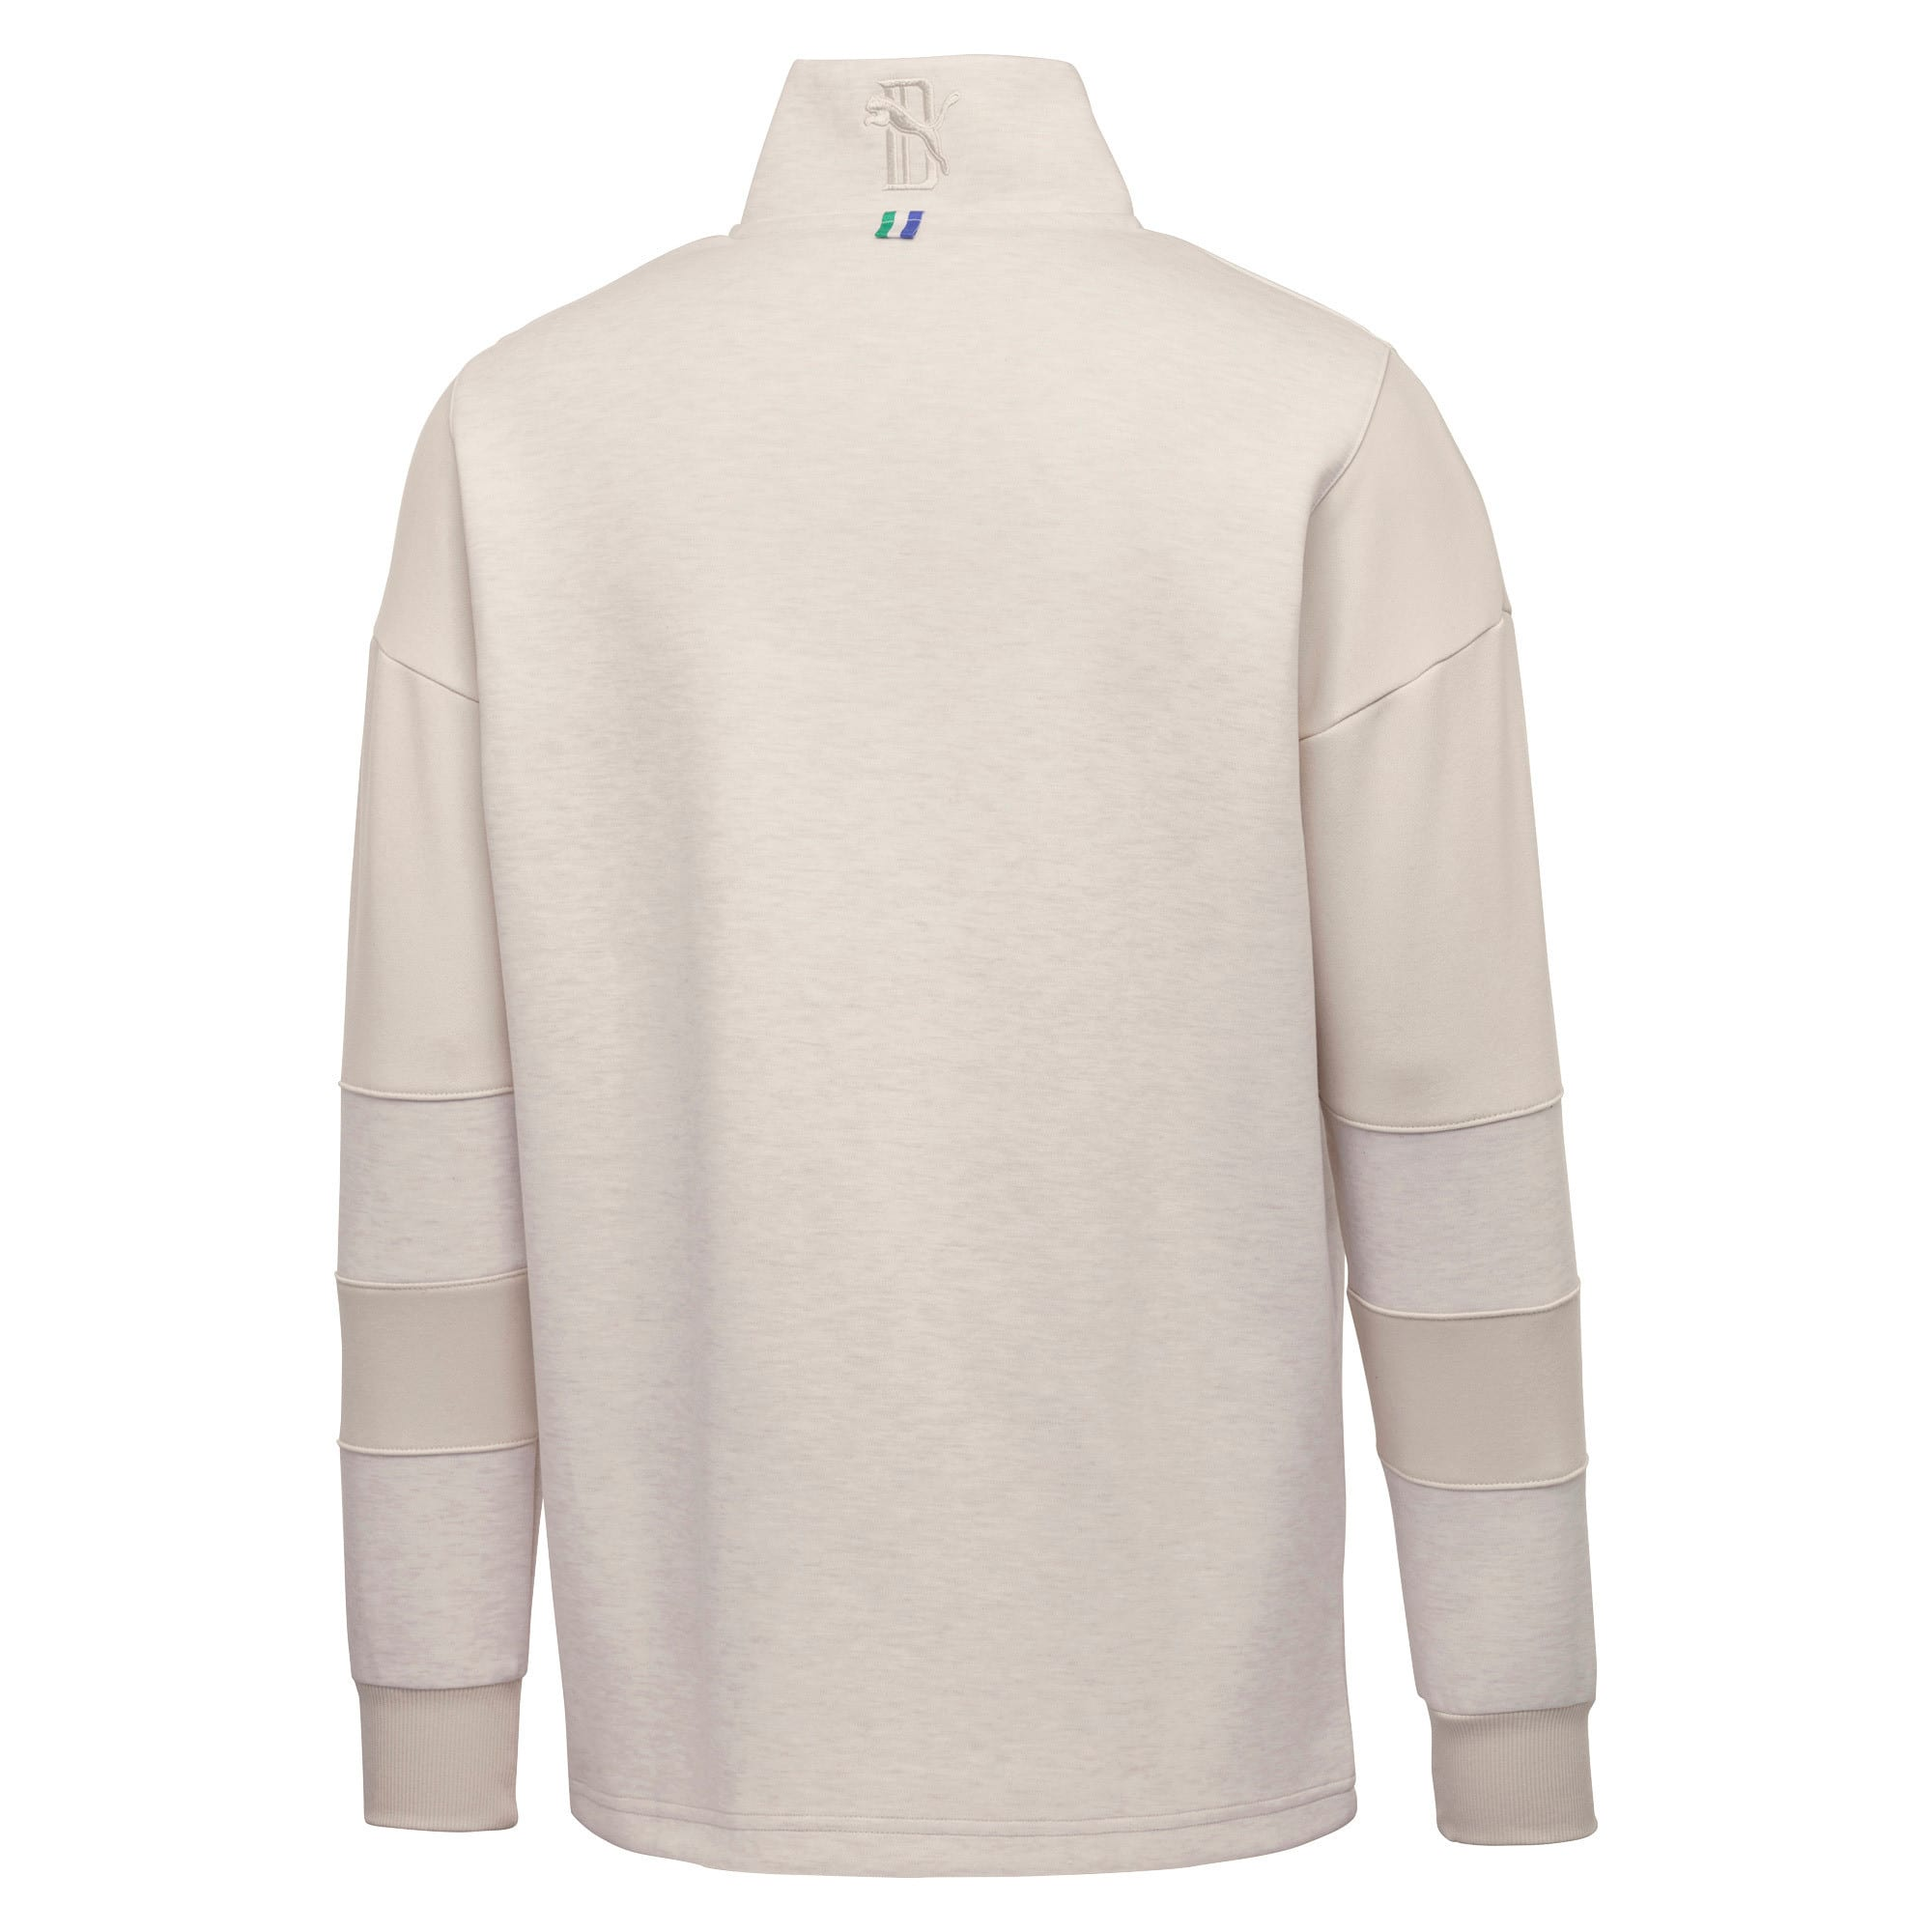 Thumbnail 2 of PUMA x BIG SEAN Half Zip Men's Pullover, Birch, medium